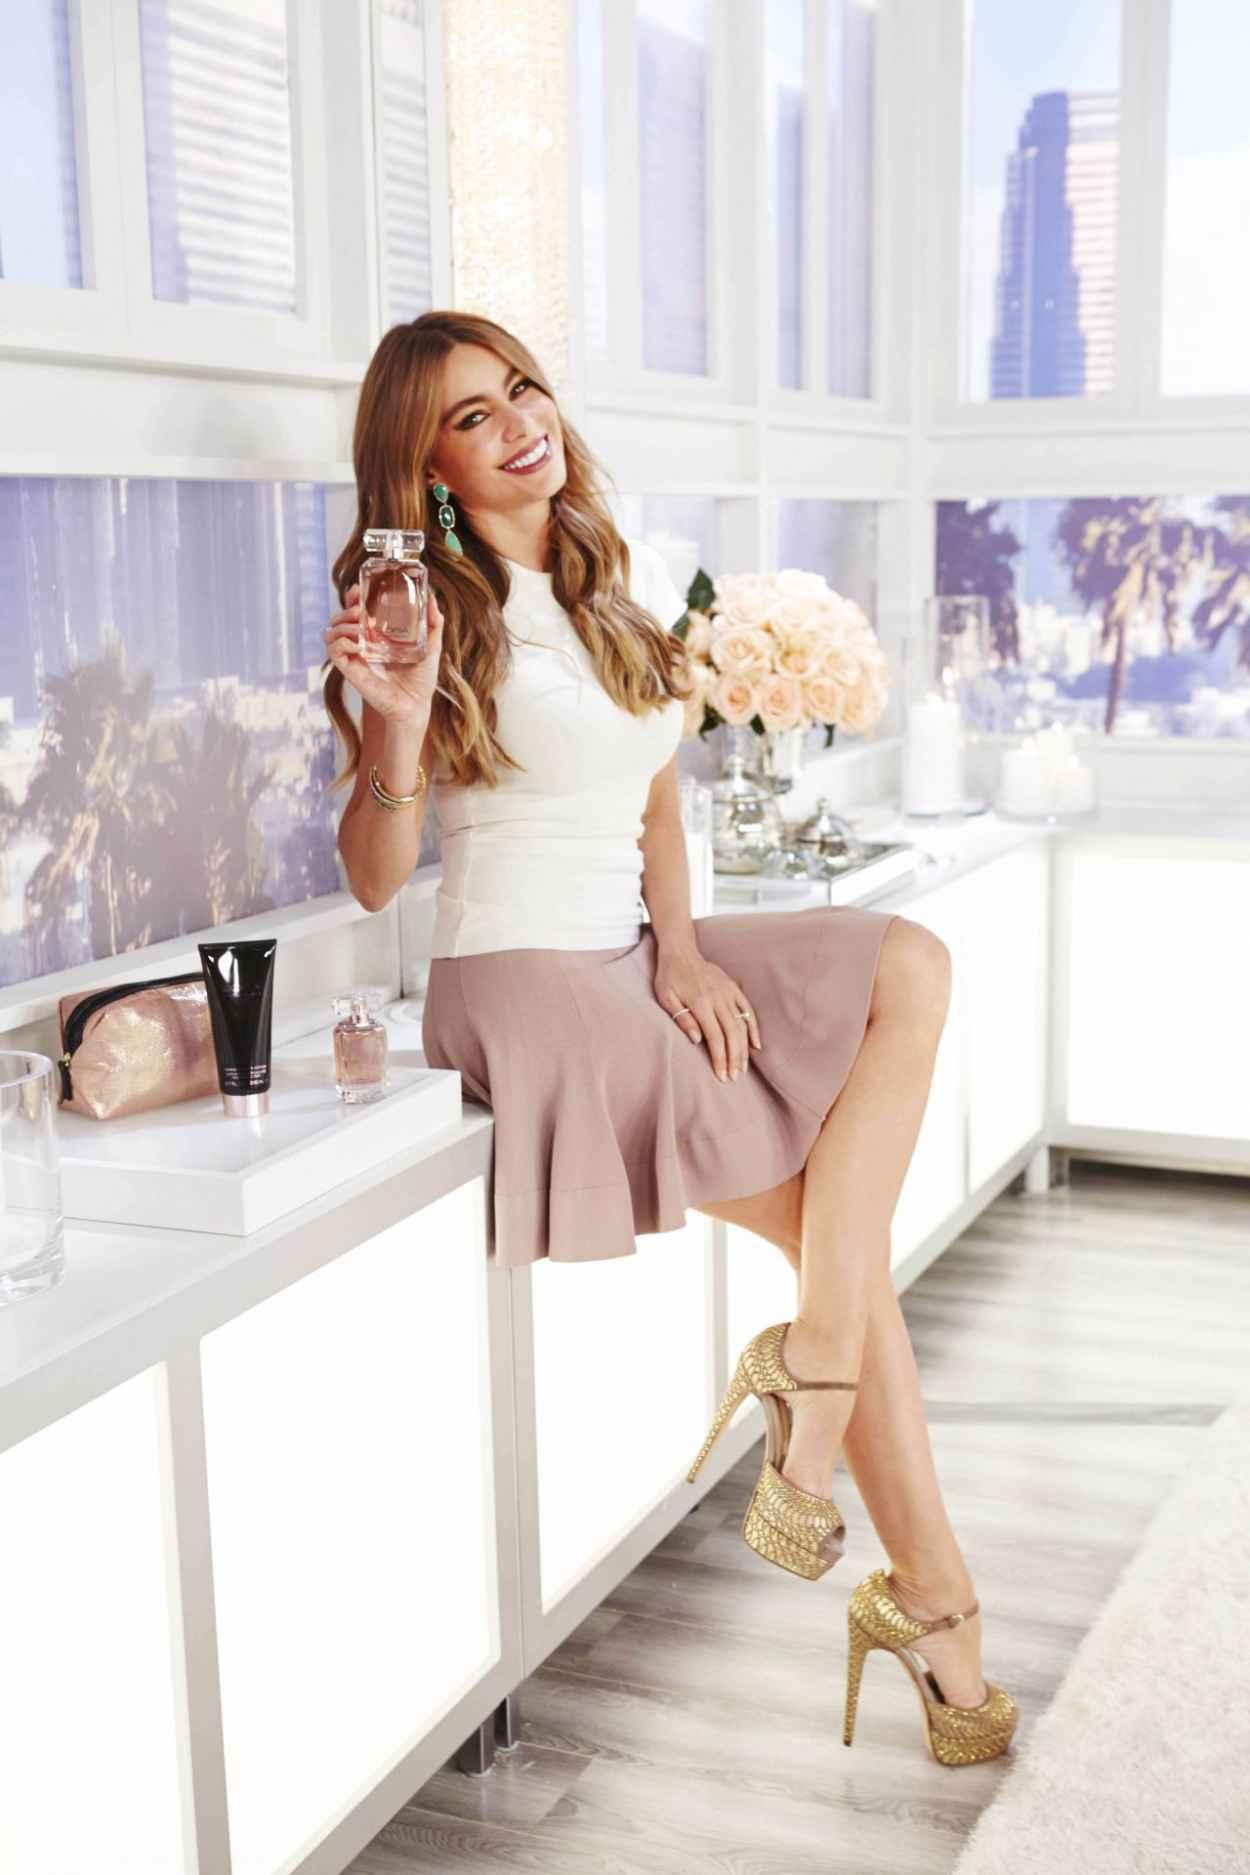 Sofia Vergara Launches New Fragrance - SOFIA-1